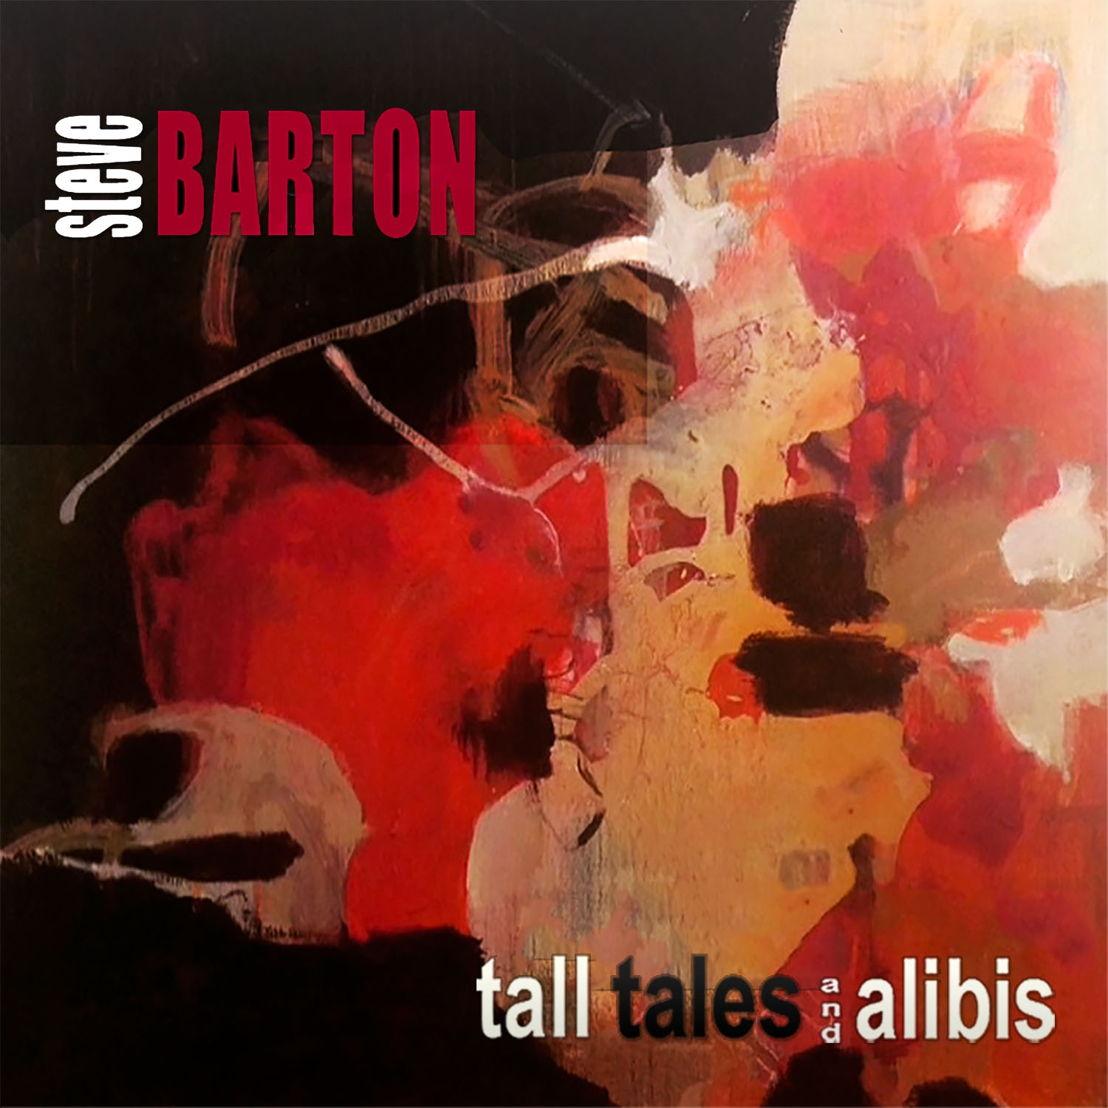 Steve Barton - Tall Tales And Alibis (triple album TBA)